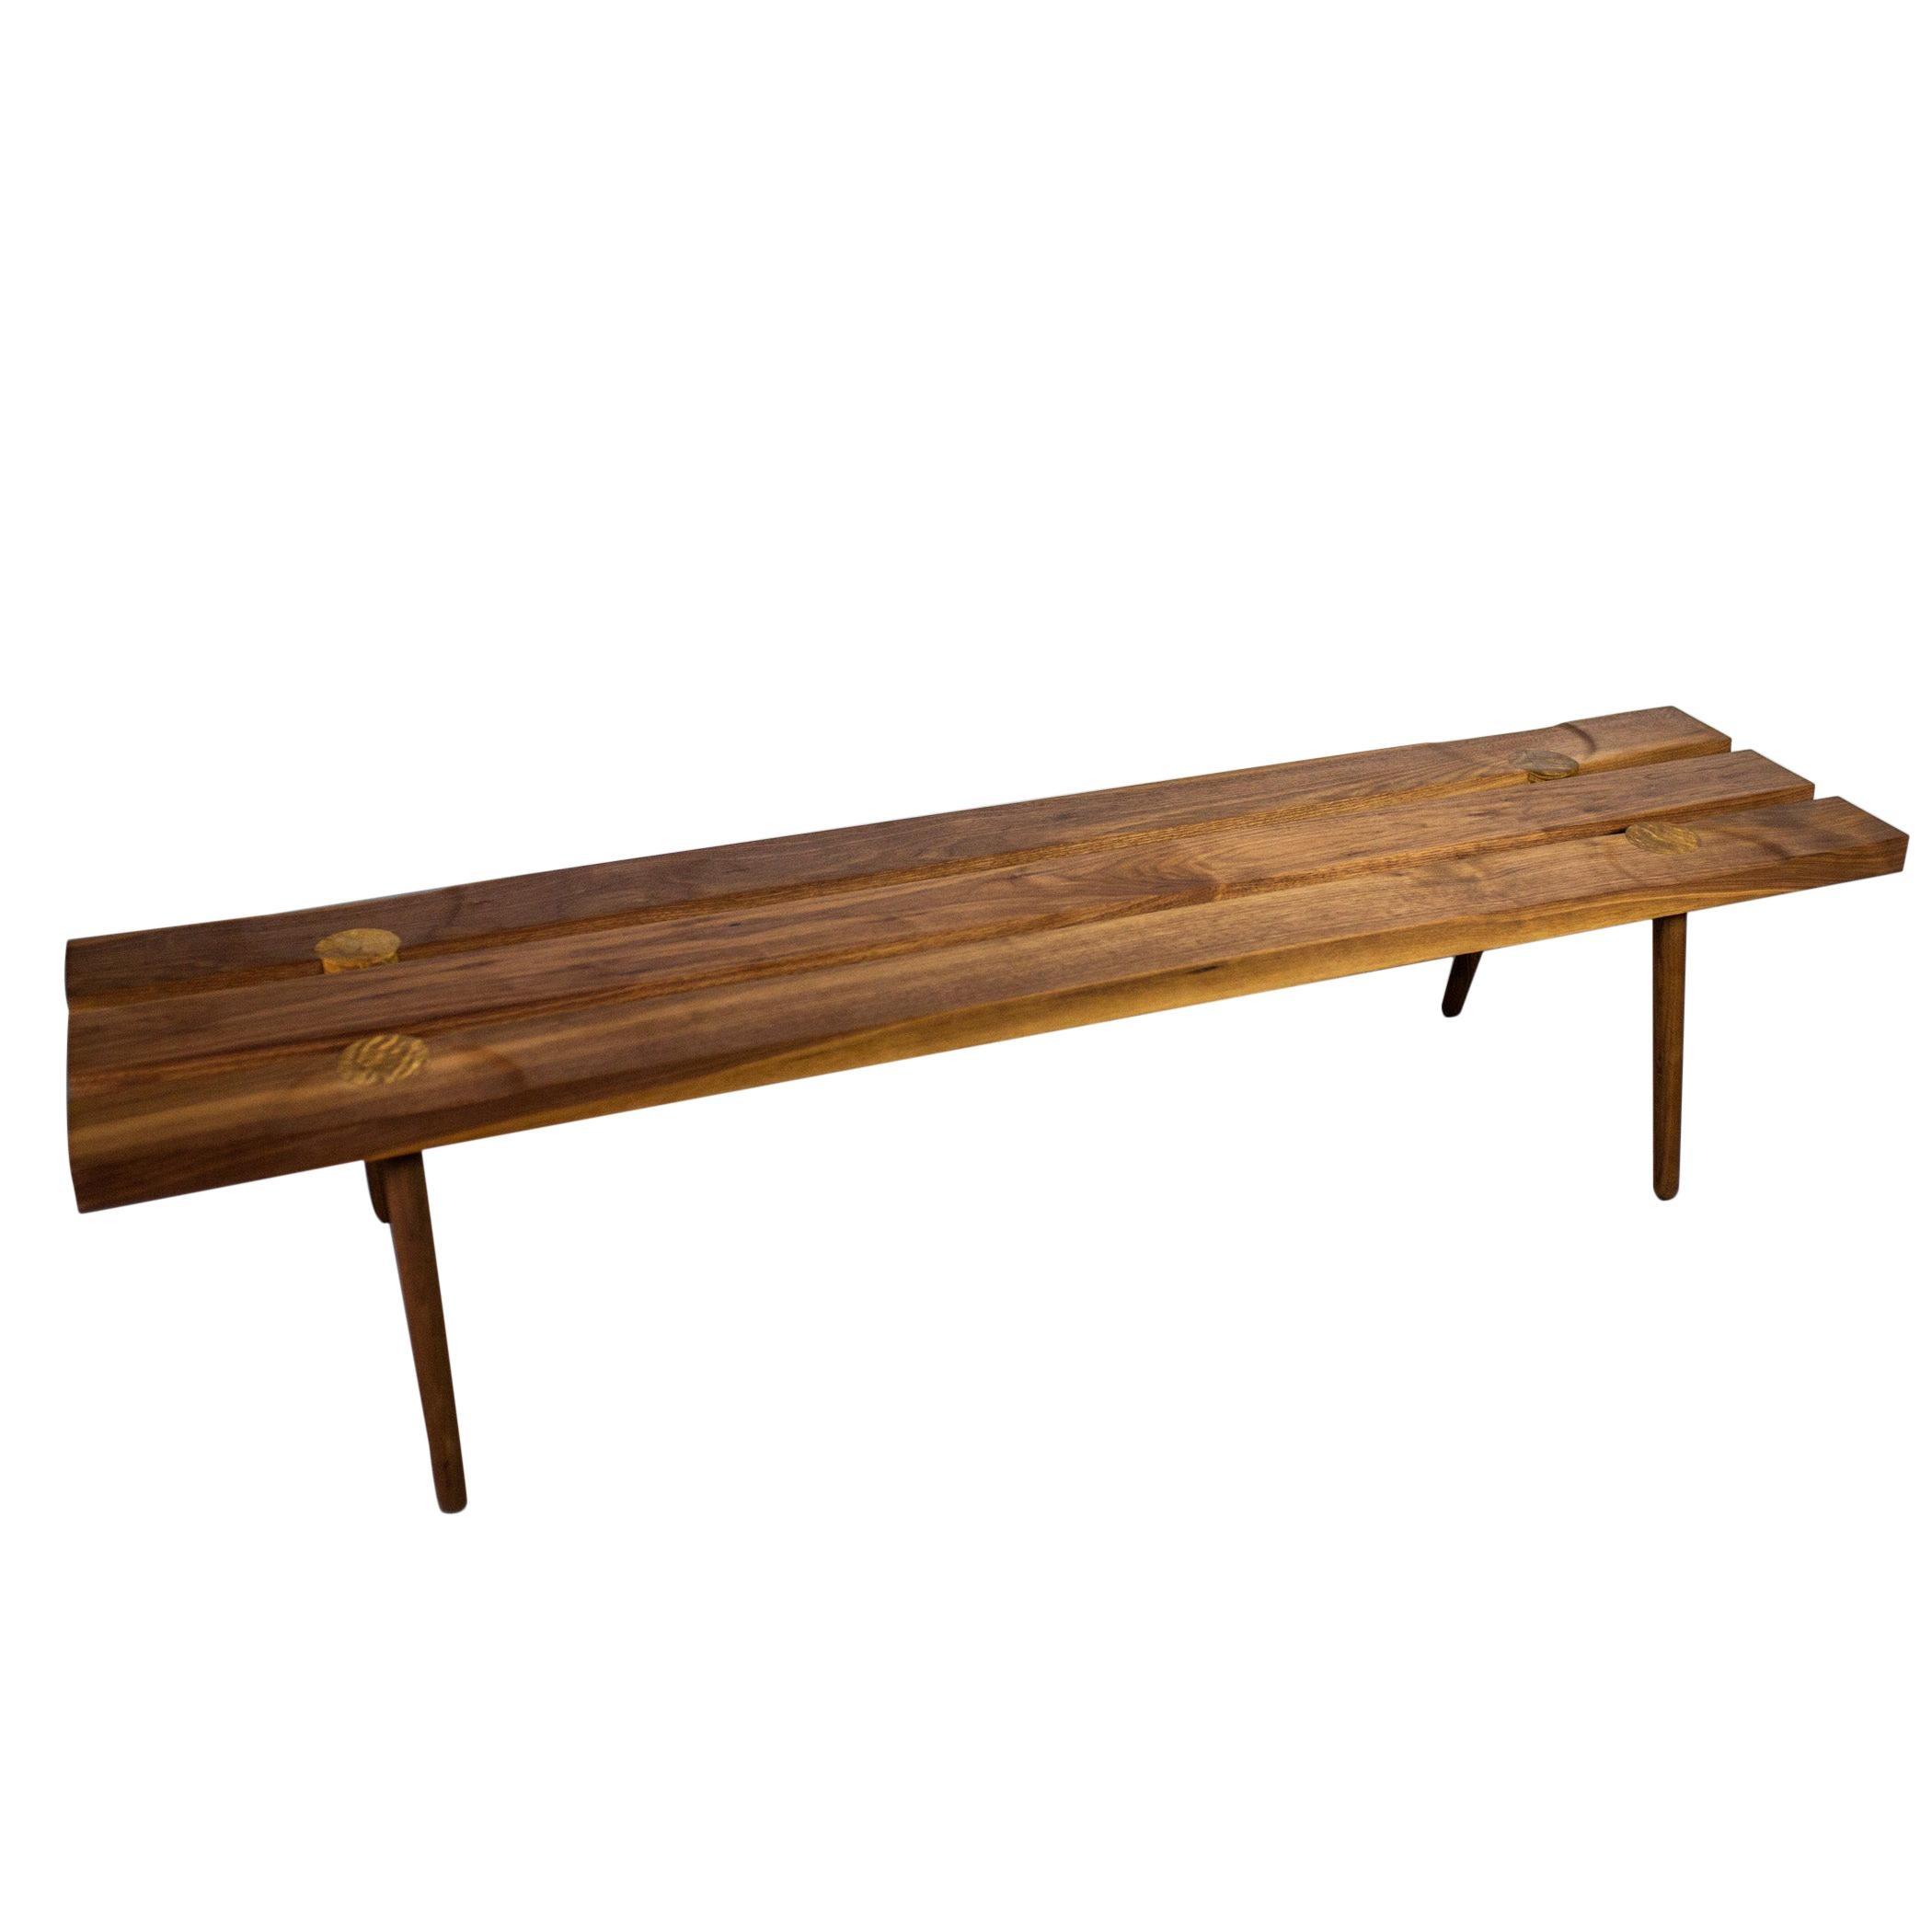 Studio Slat Bench by Michael Rozell USA 2020 in Walnut and White Oak Inlays